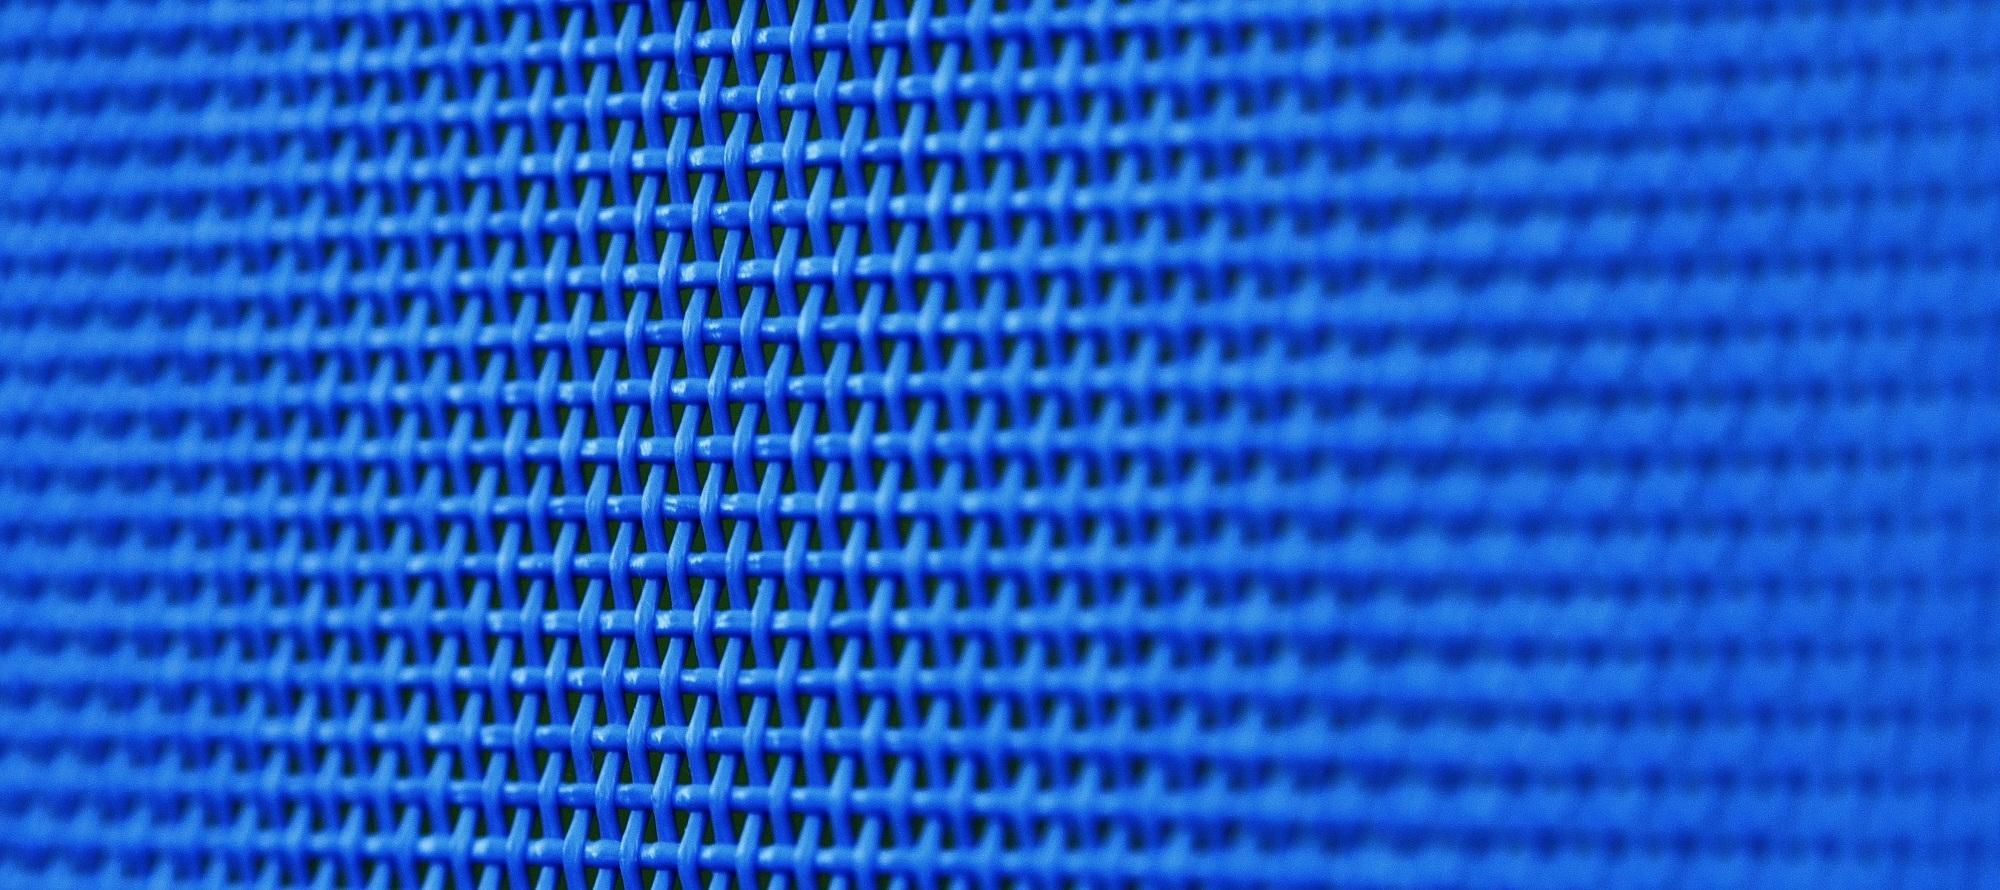 gambar   struktur  teknologi  pencakar langit  pola  garis  biru  dekat  lingkaran  kain  desain